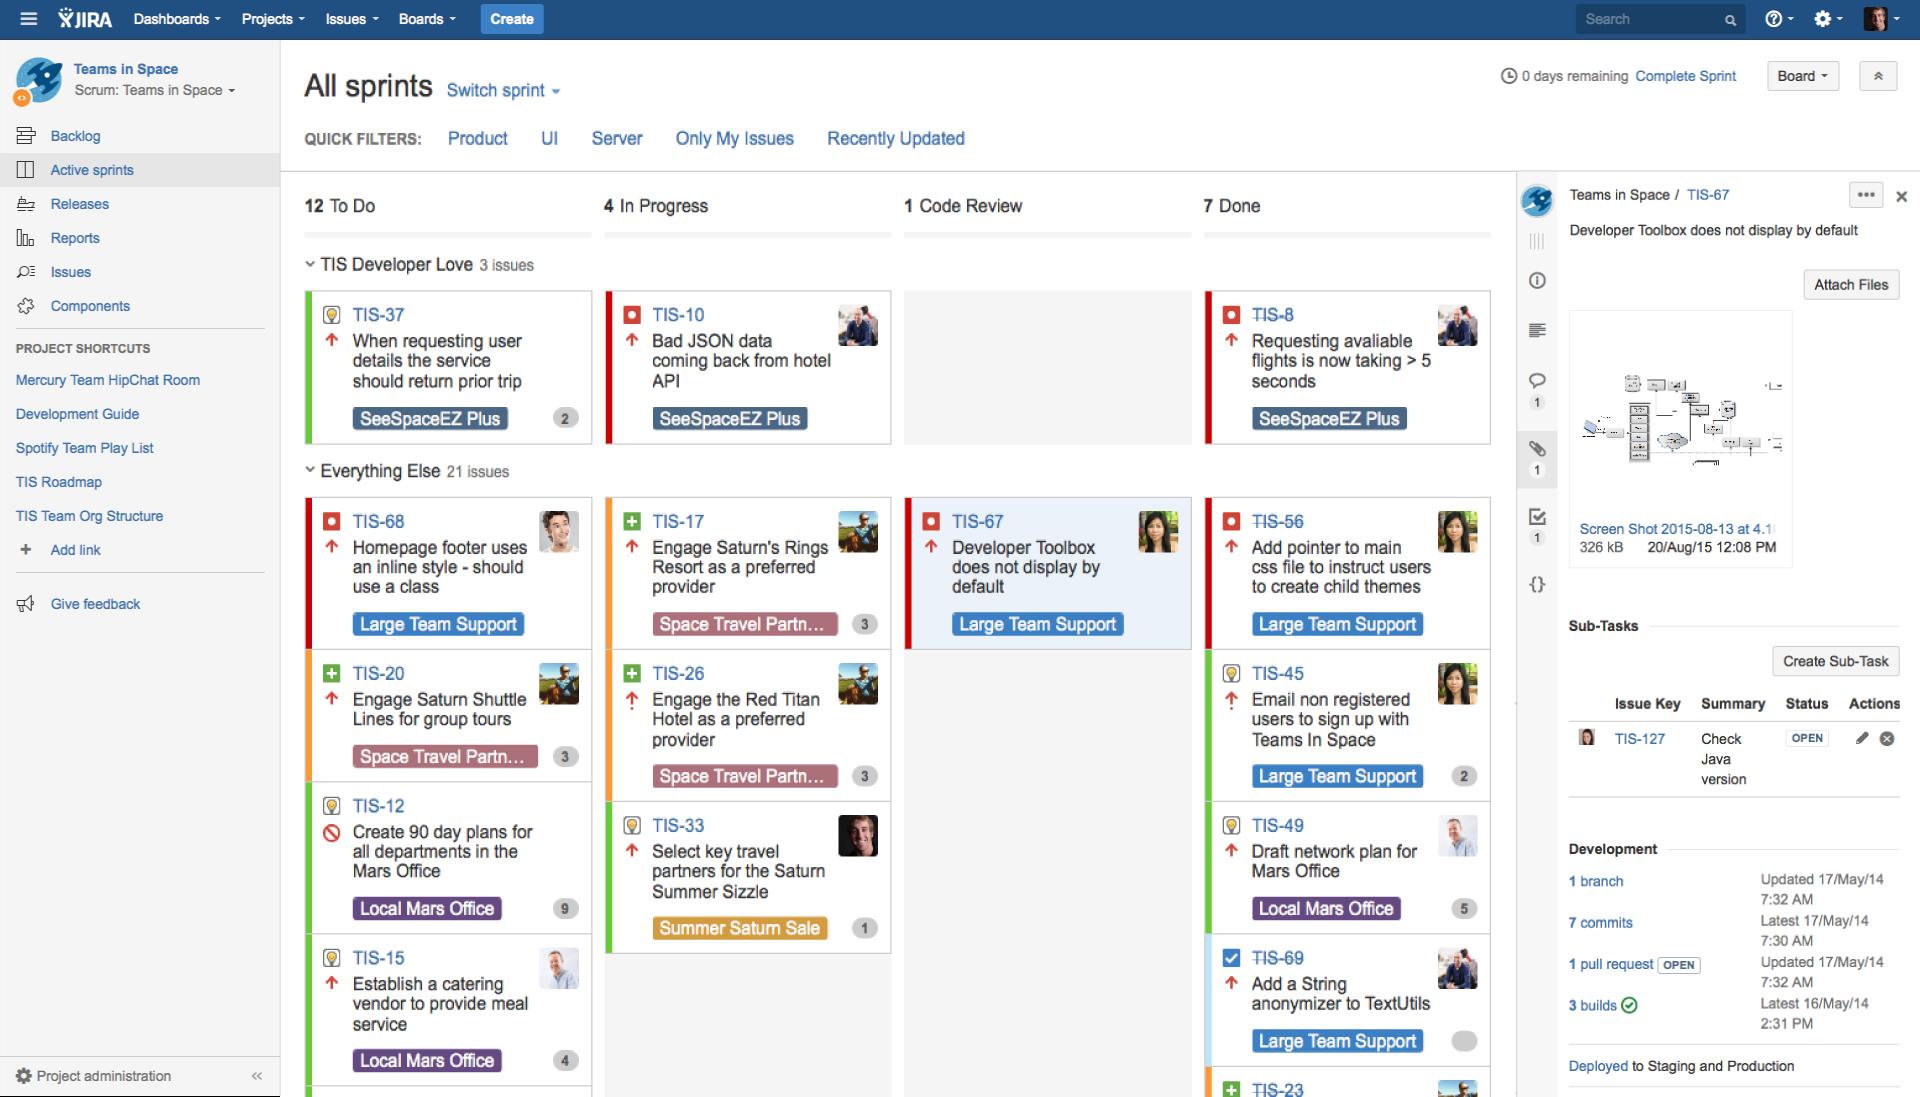 Jira Software - Agile Development